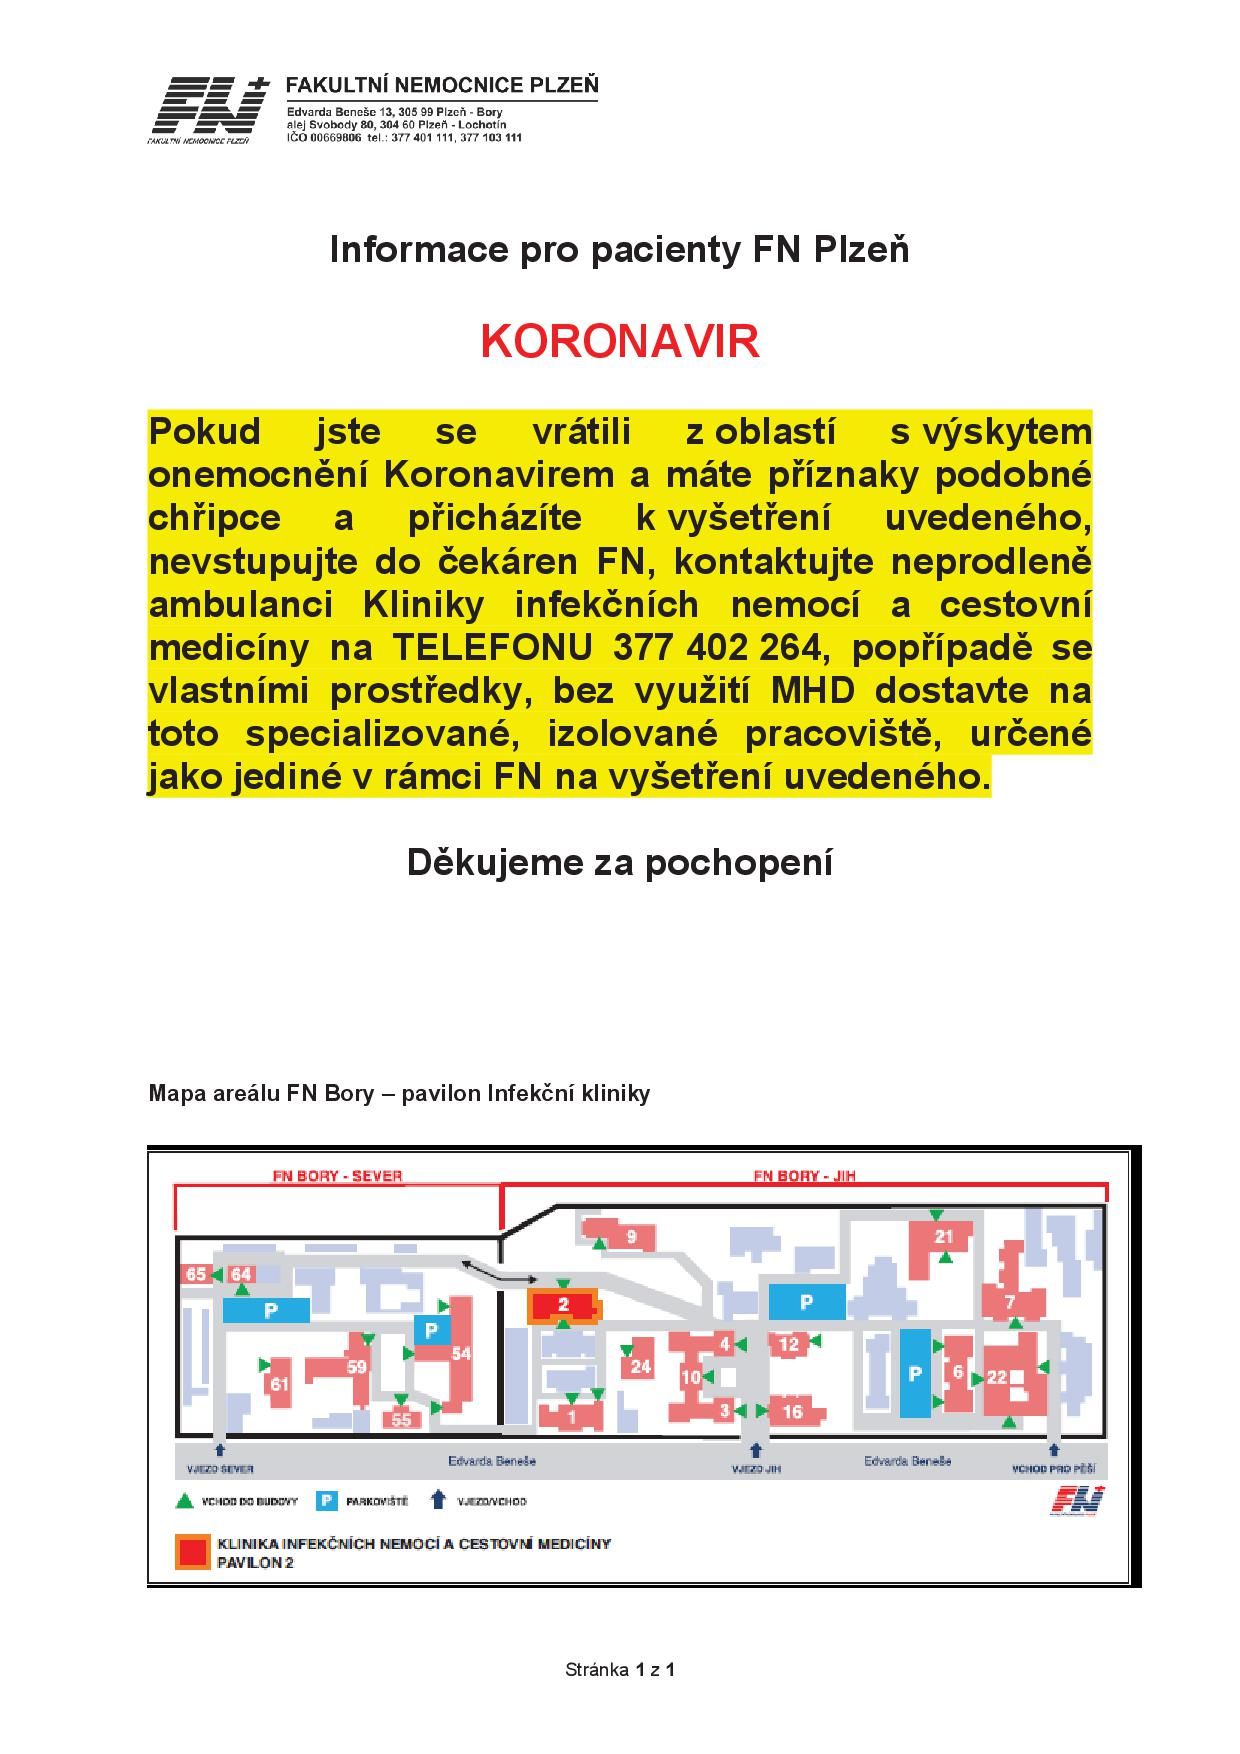 Obrázek na adrese https://www.fnplzen.cz/sites/default/files/dokumenty/koronavir/Info_koronavir_2.jpg